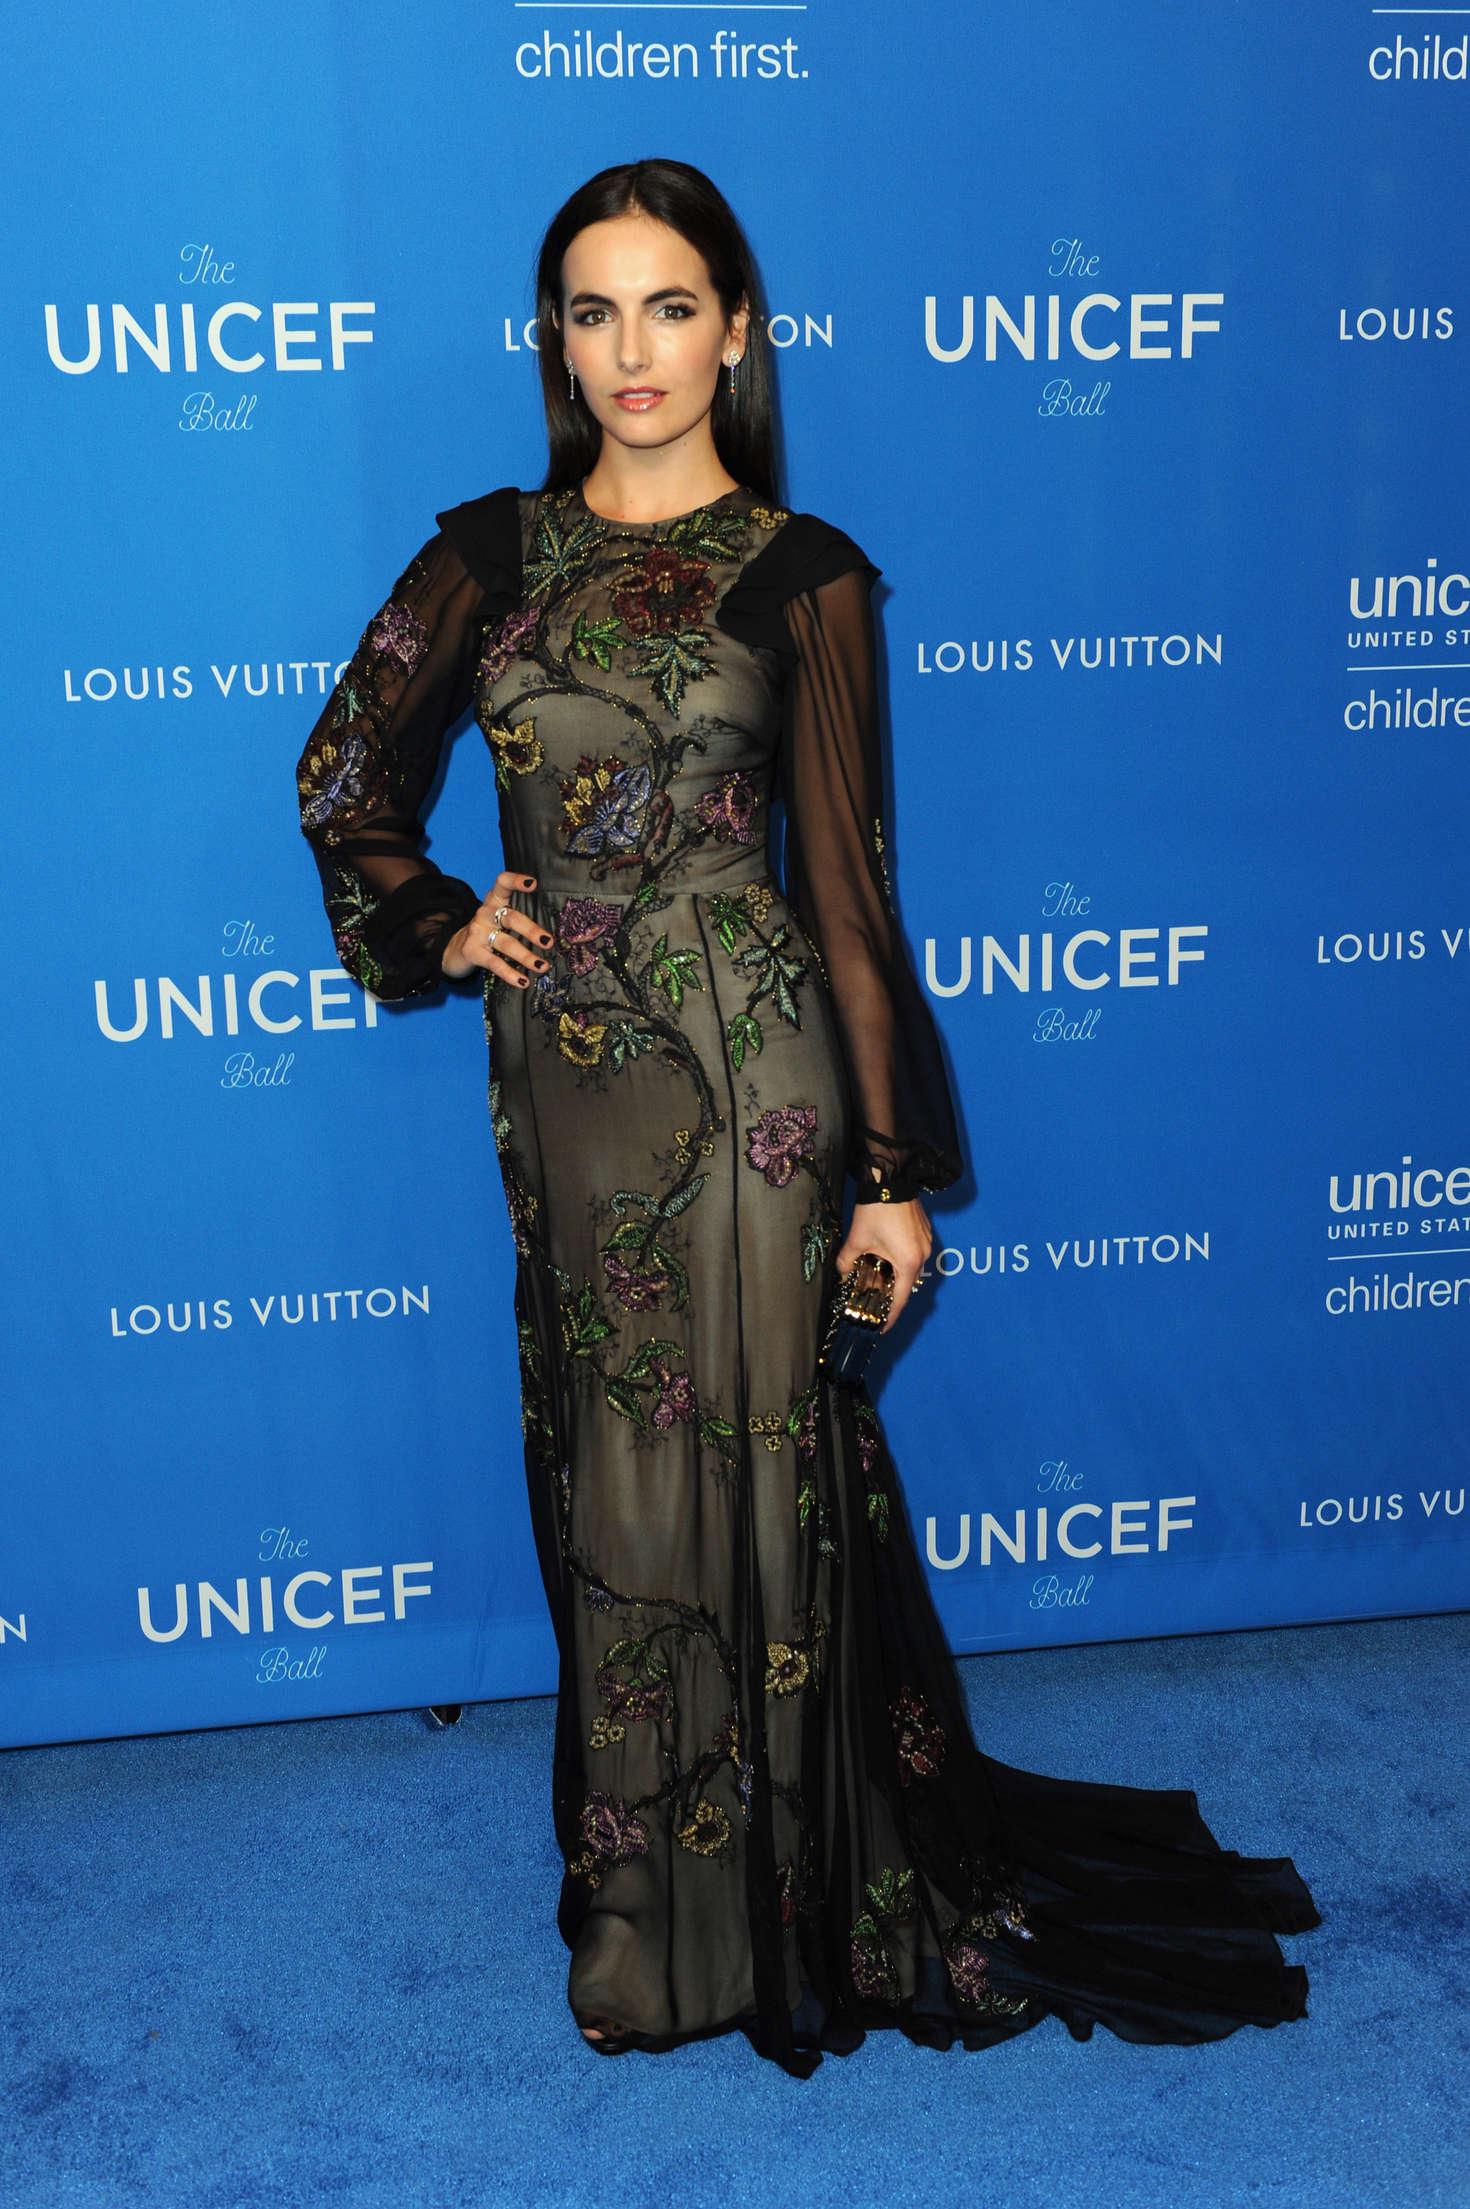 Camilla Belle 2016 : Camilla Belle: 6th Biennial UNICEF Ball -01